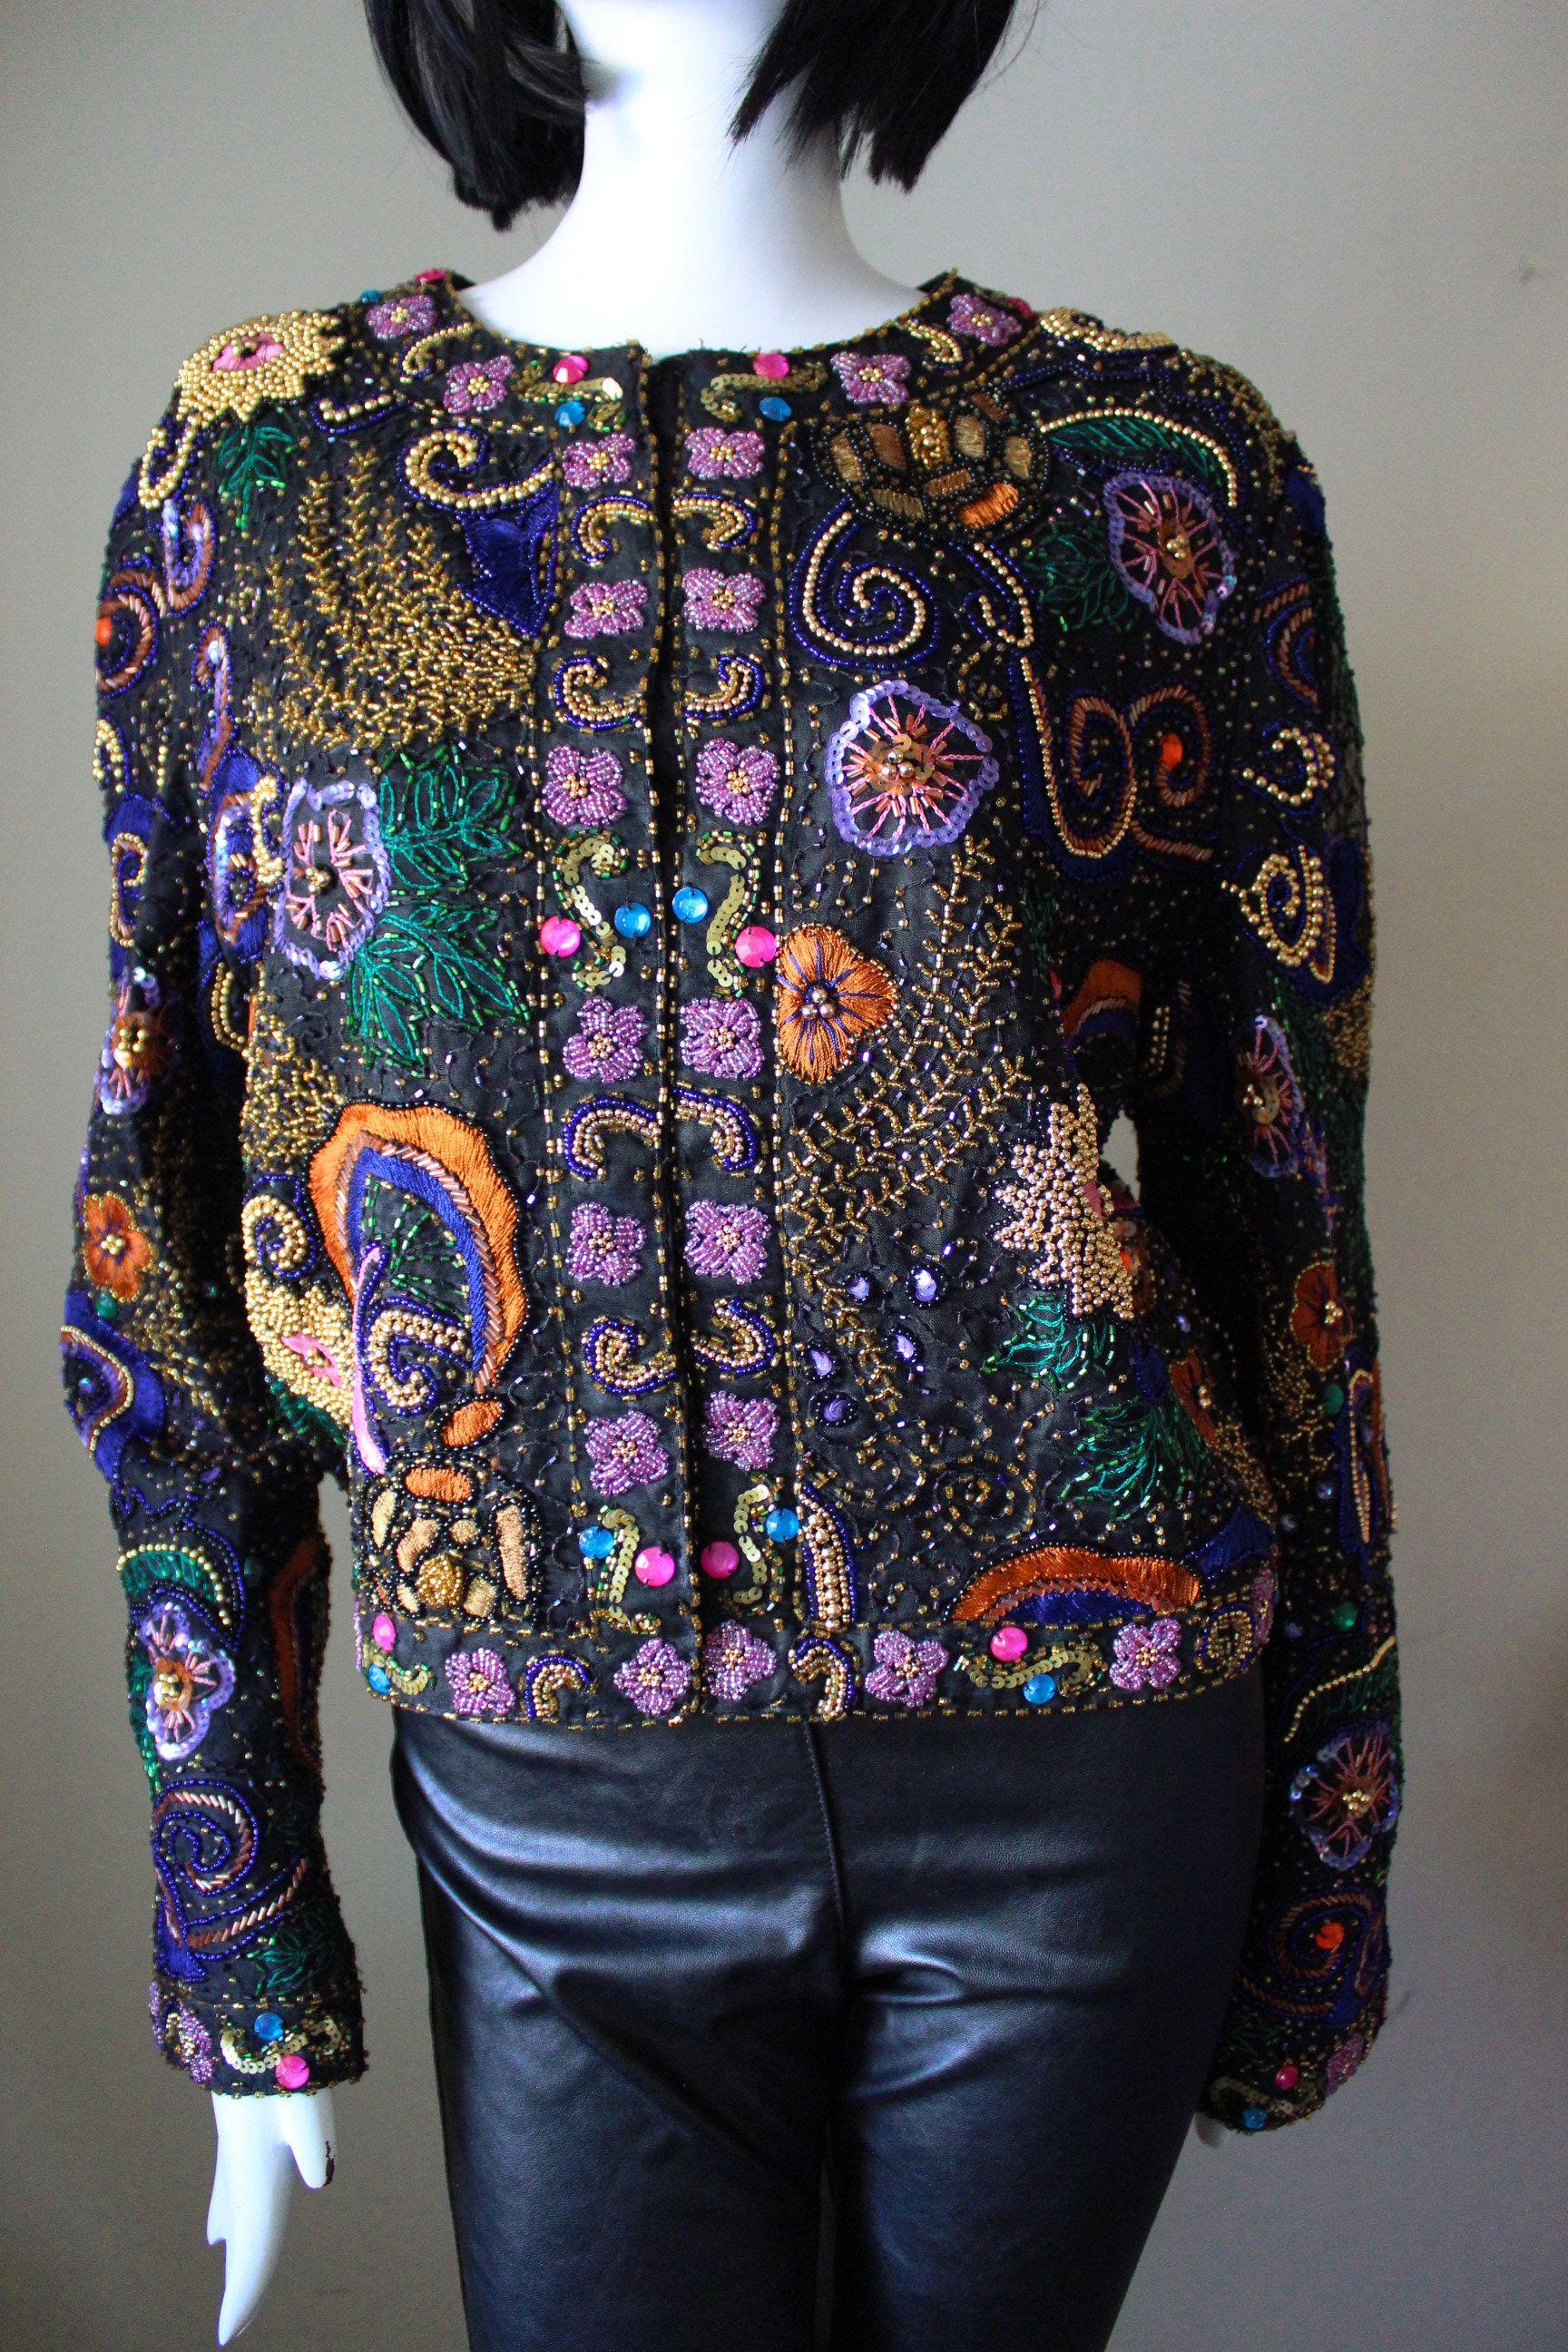 af42c8b1 Sequin beaded jacket, embroidered, Laurence Kazar, silk, vintage, 1980s,  short, long sleeve. Excellent condition